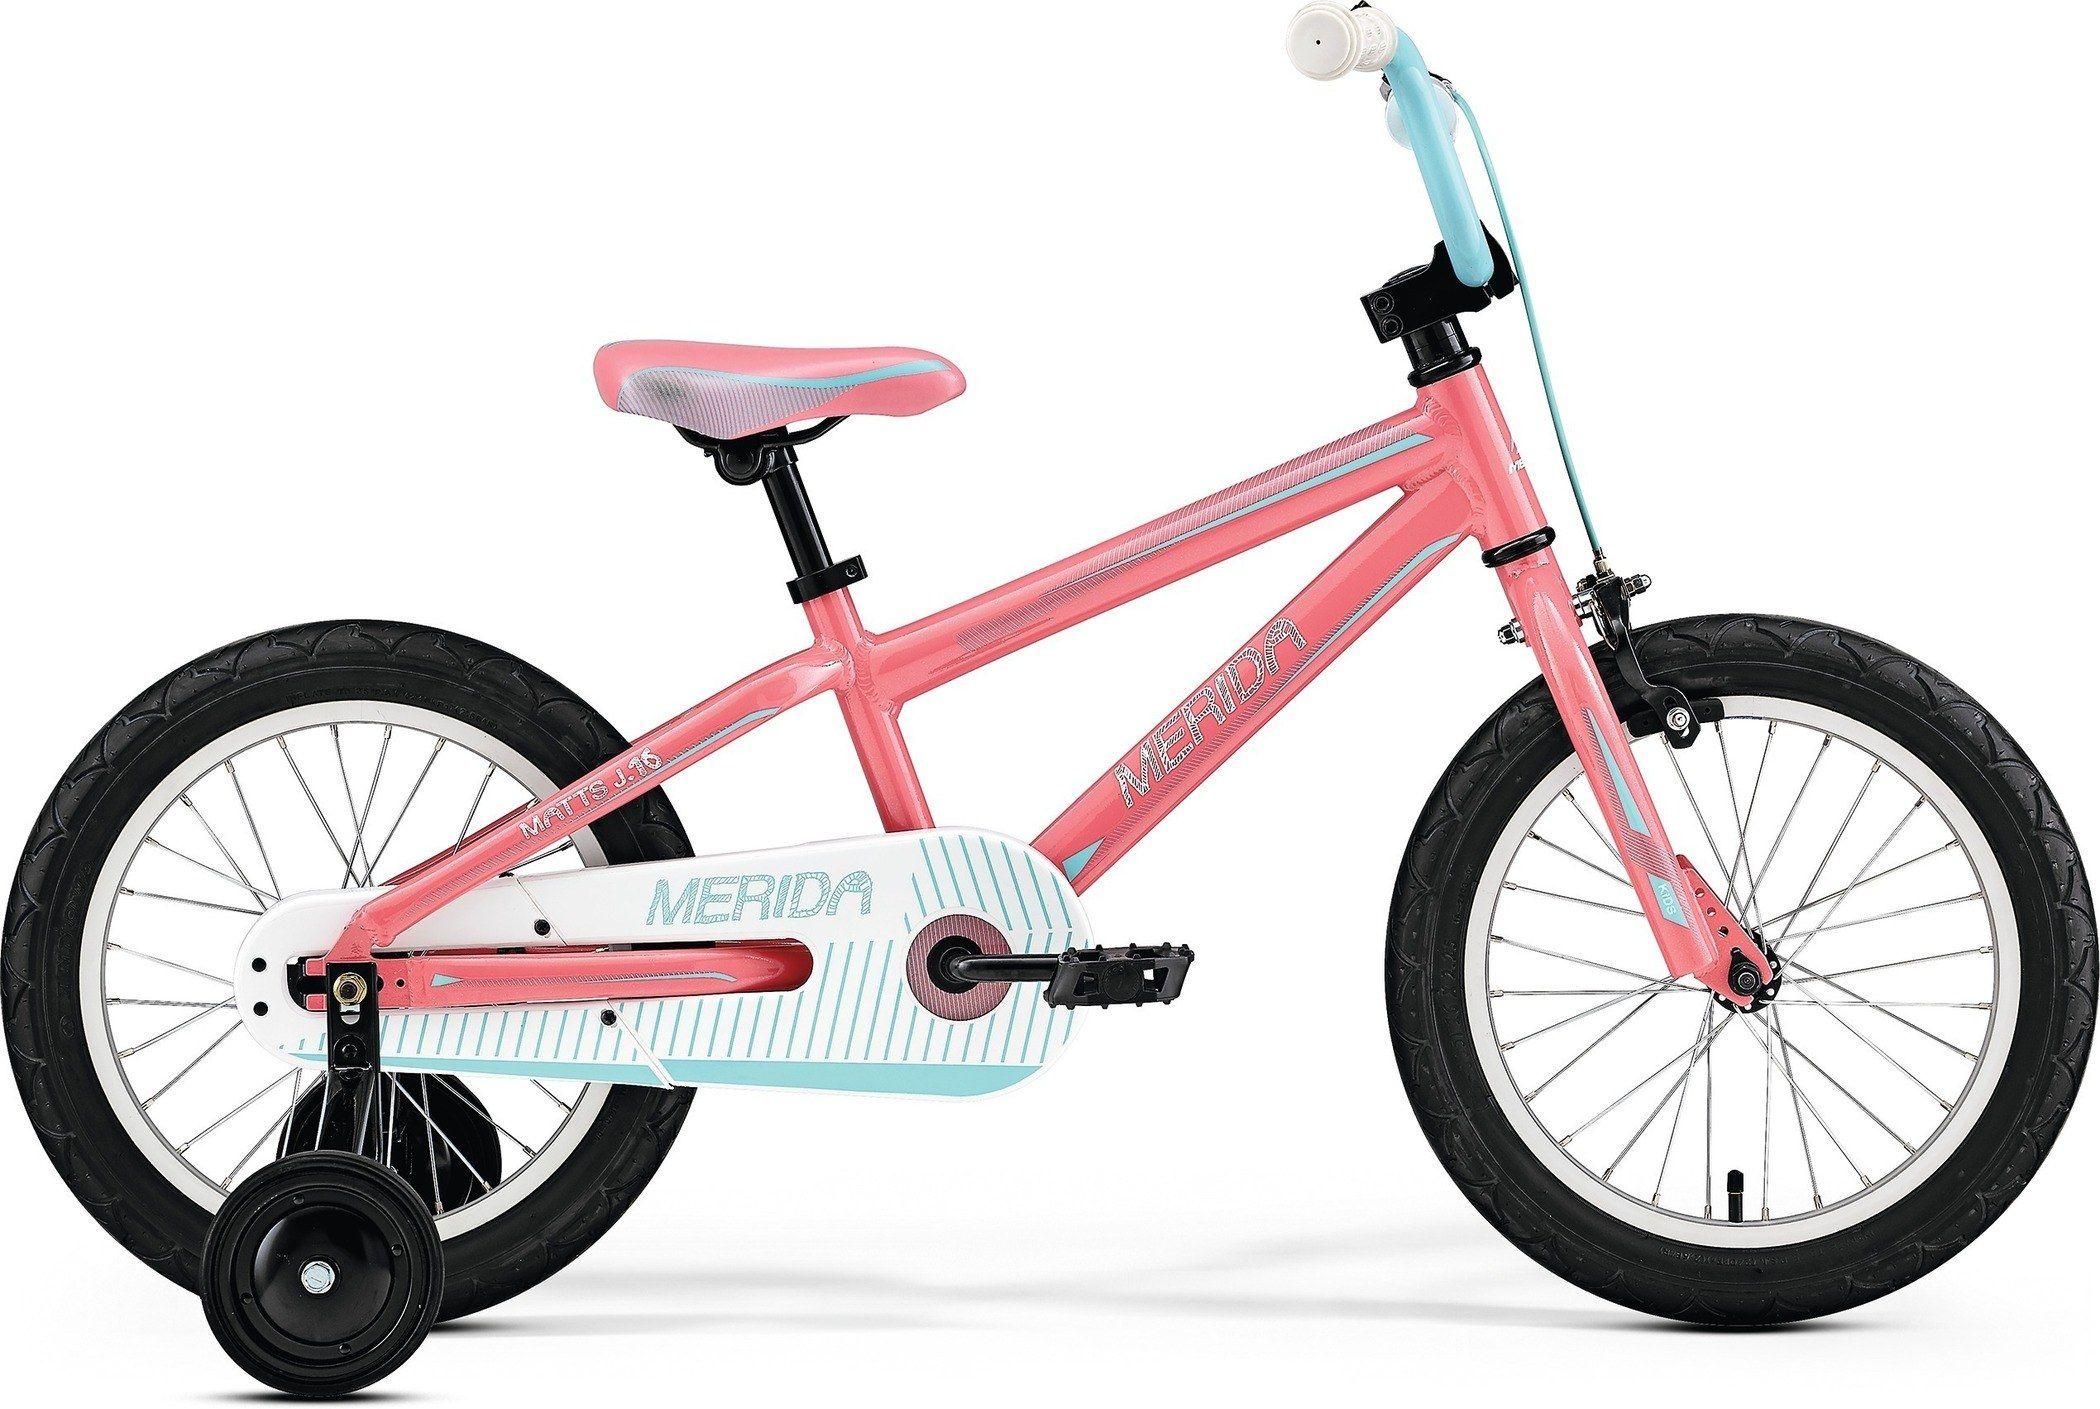 Trek Kickster For Boys Balance Bike With Foot Rest Adjustable Seat Post And Handlebar Kids Bike Balance Bike Bike